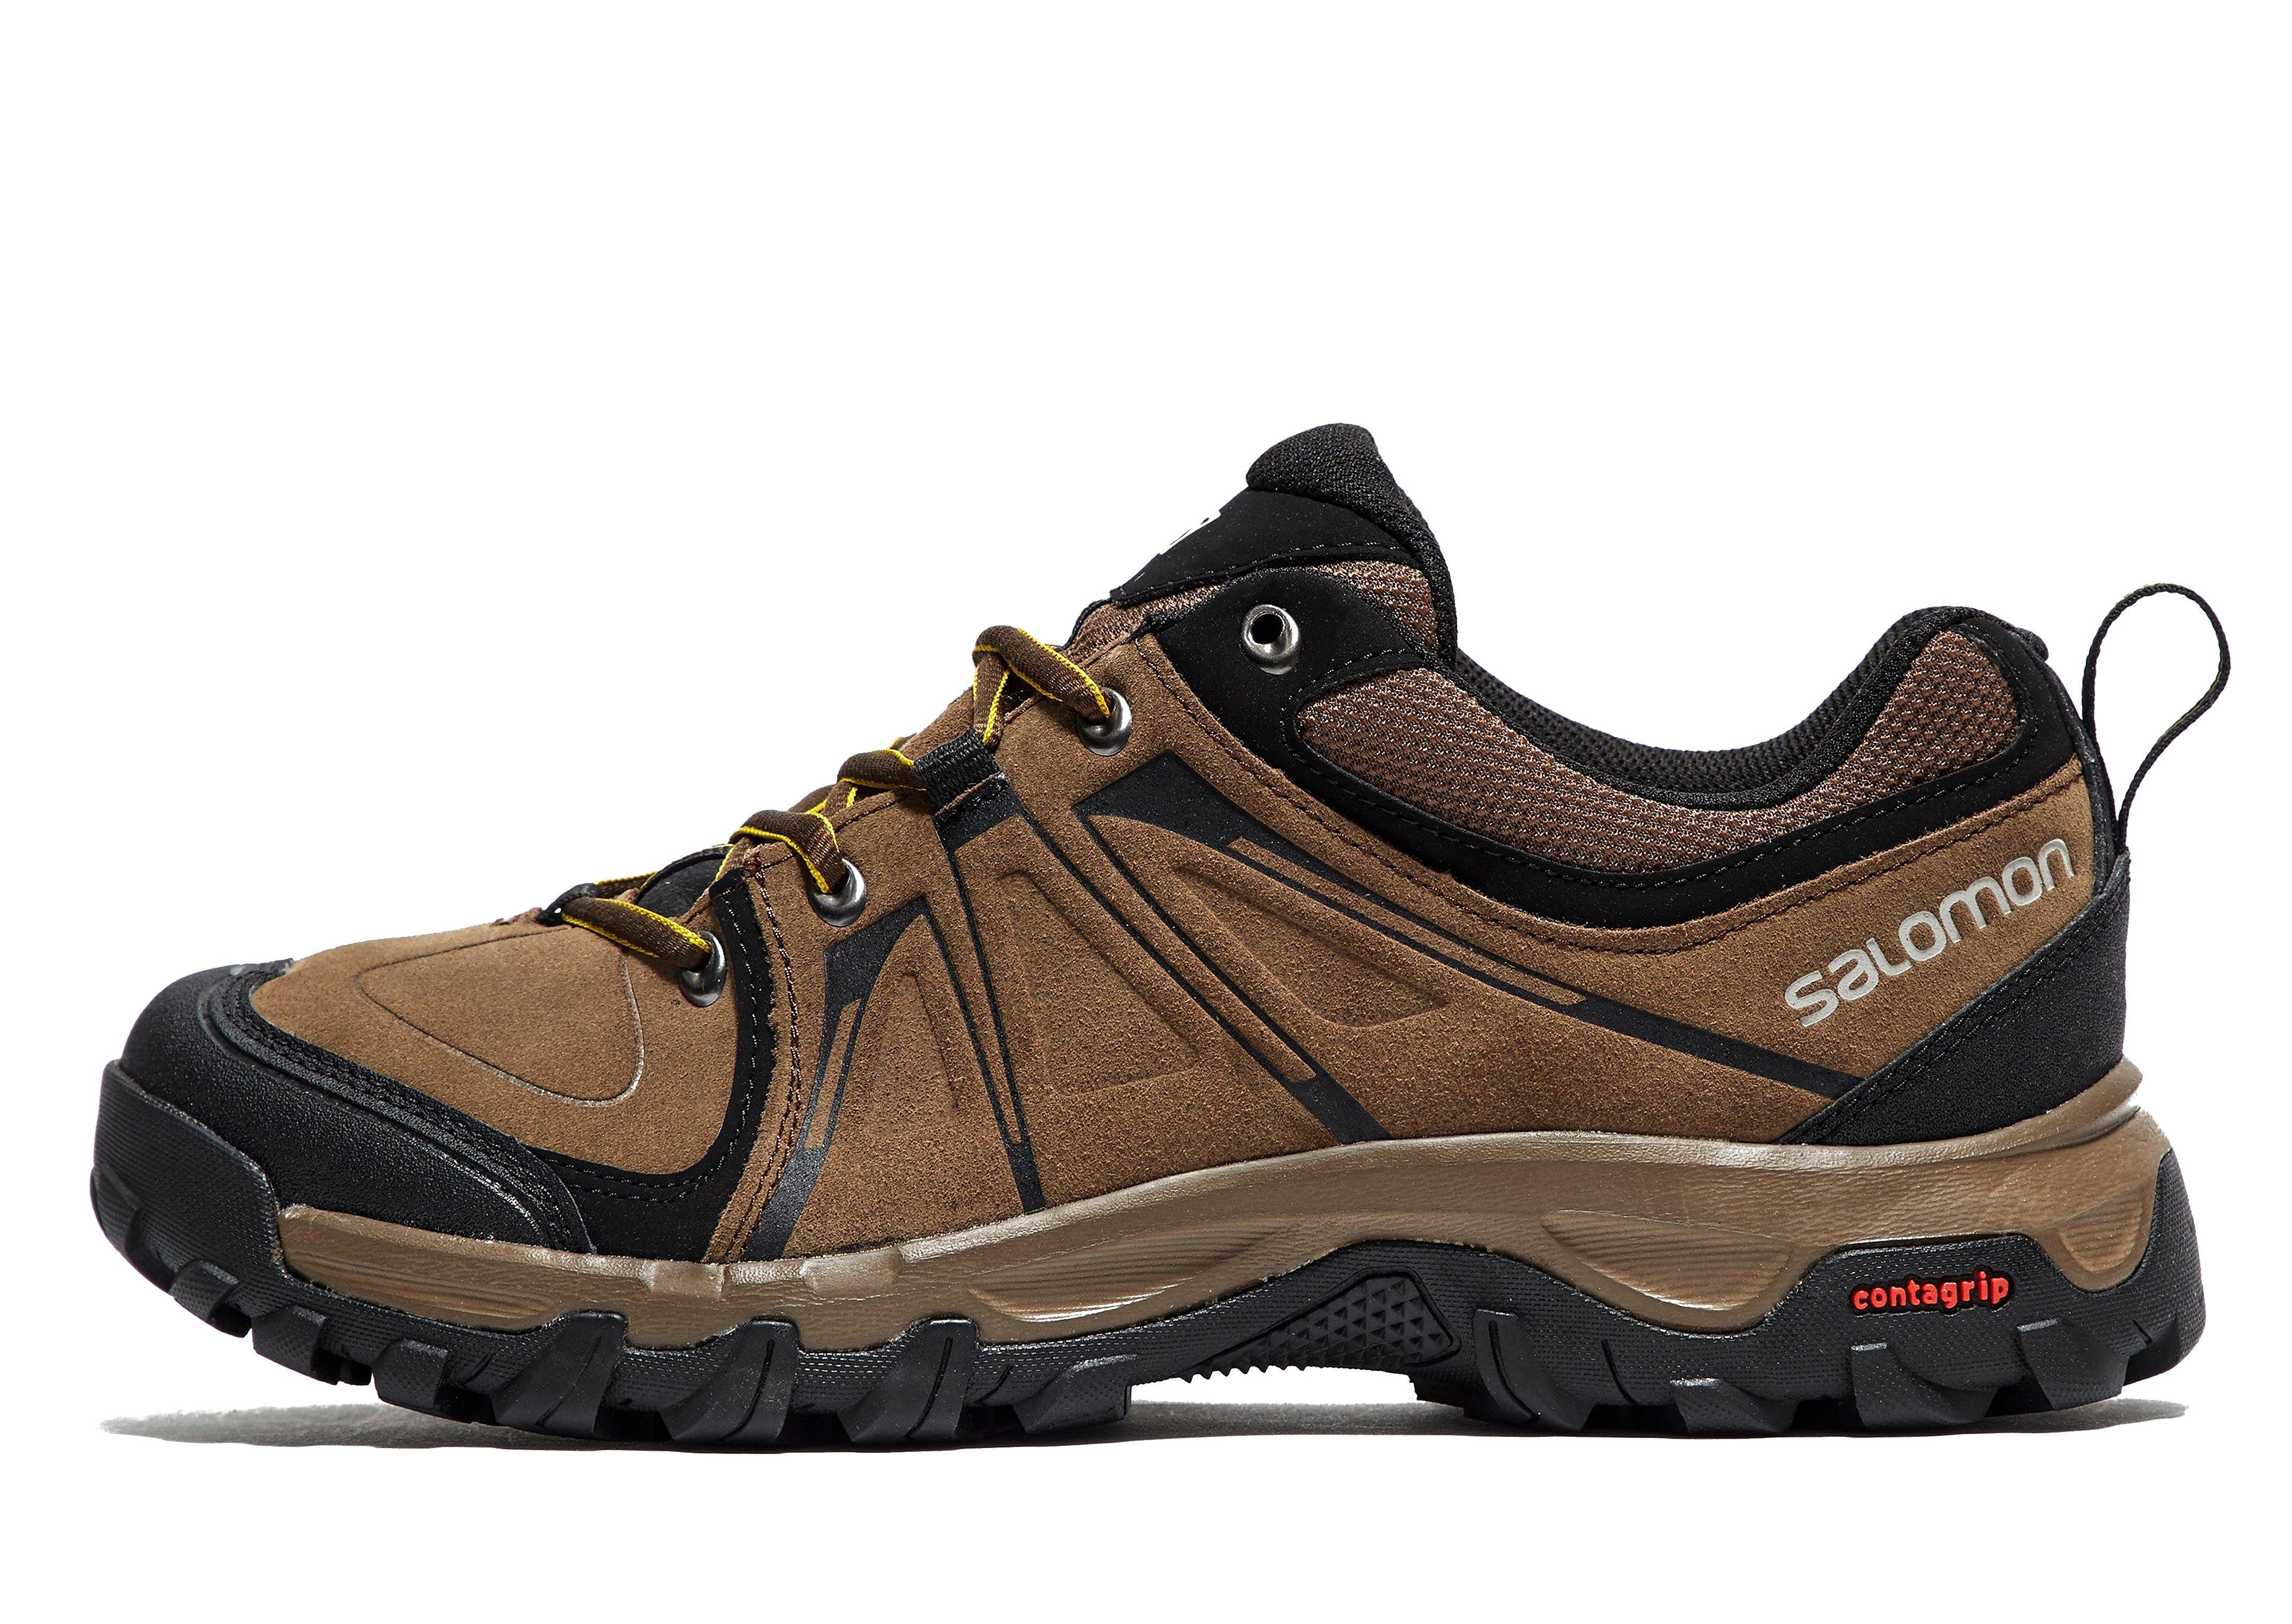 Salomon Evasion LTR Hiking Shoes